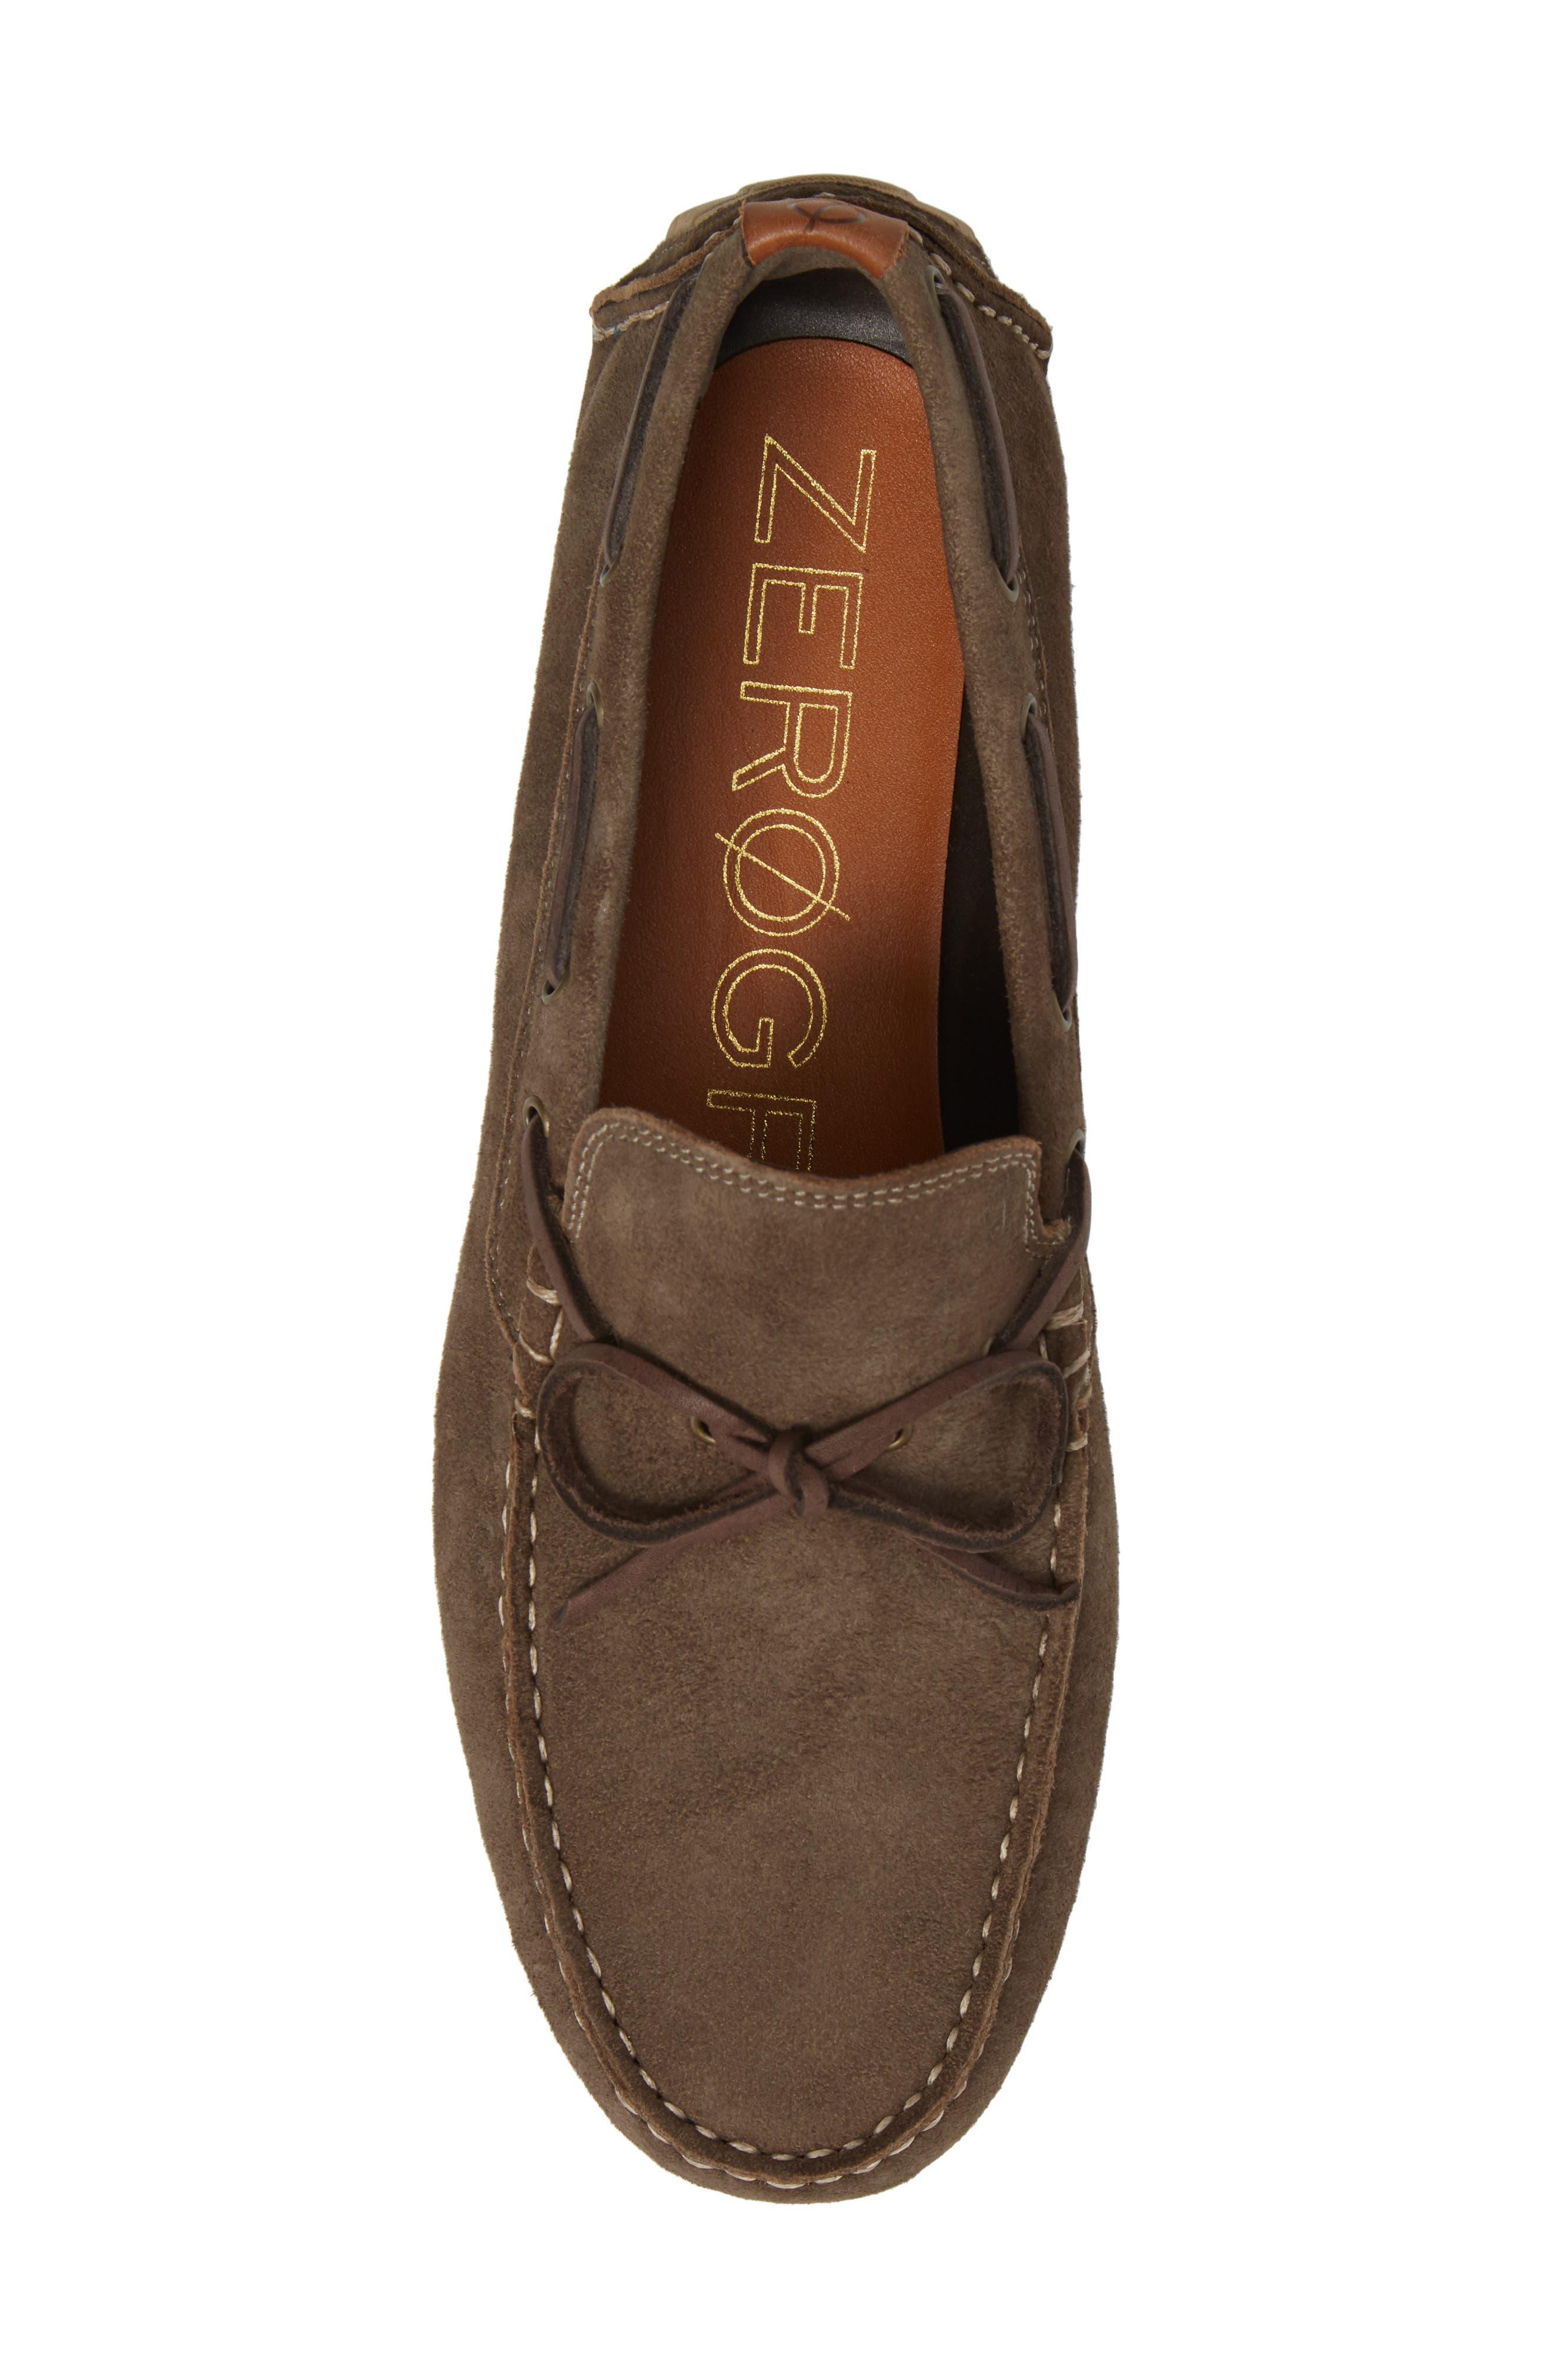 Zero Grand Moc Driving Loafer,                             Alternate thumbnail 5, color,                             Morel Leather